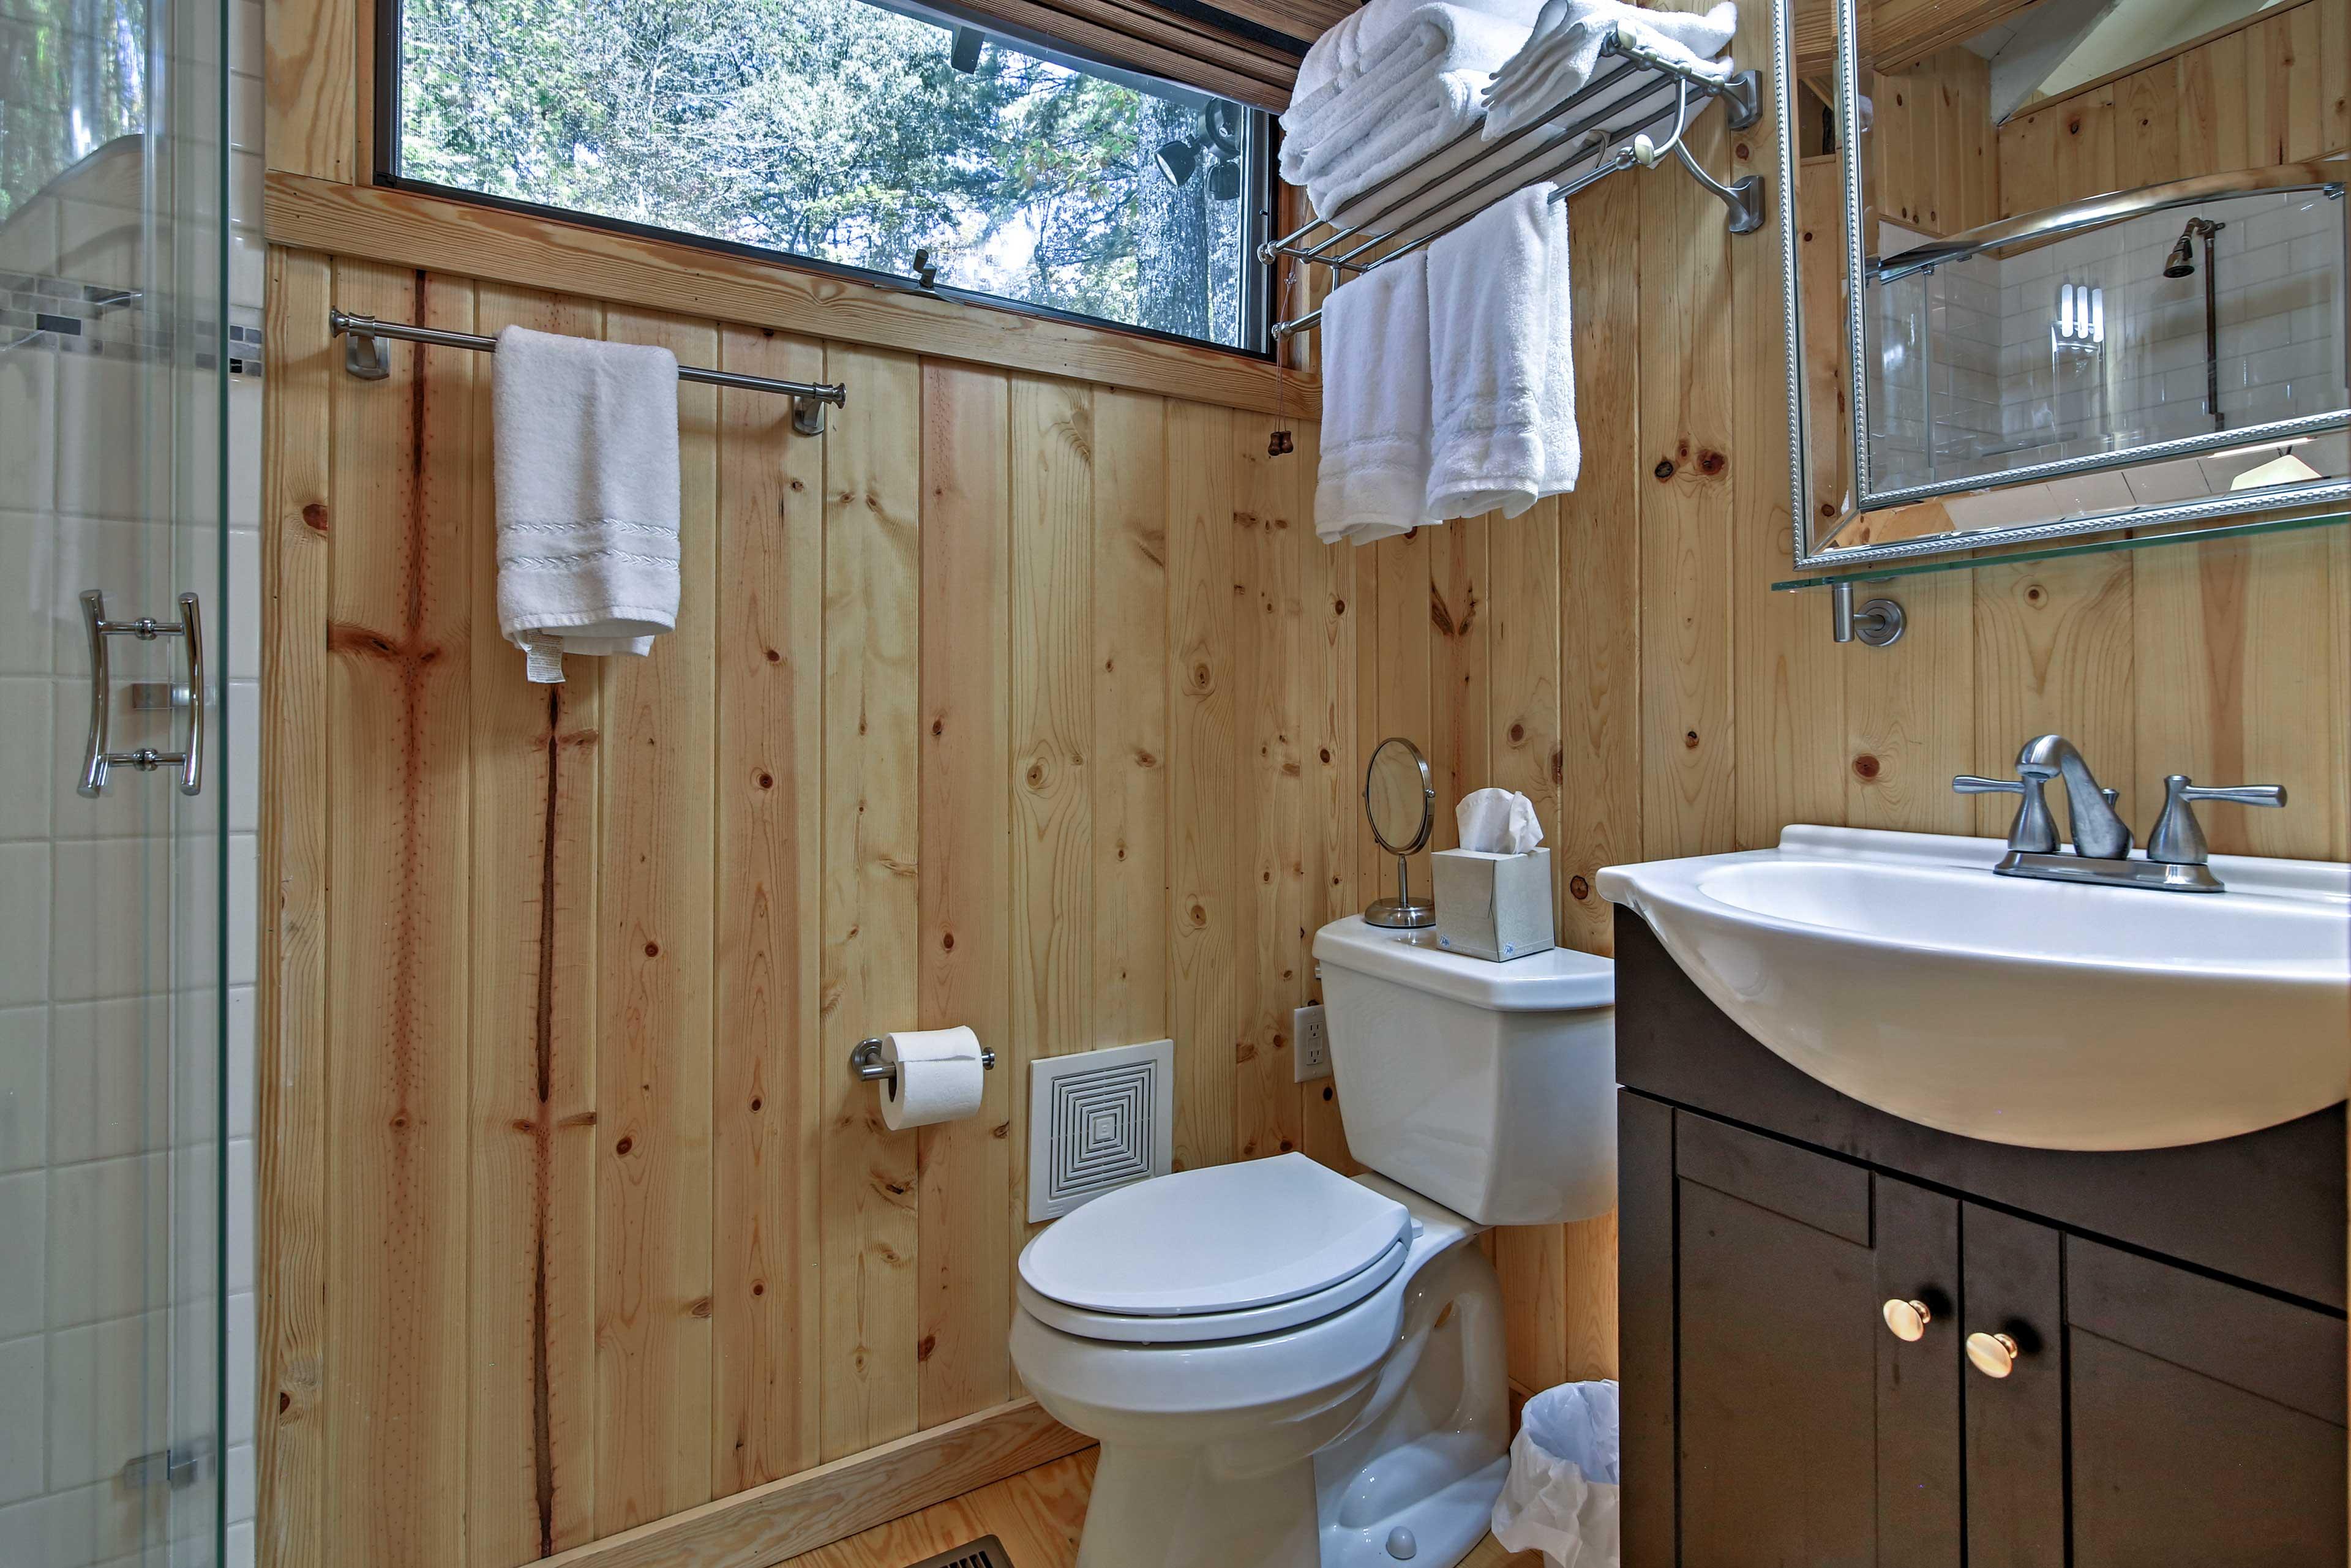 This bathroom boasts natural wood paneling.